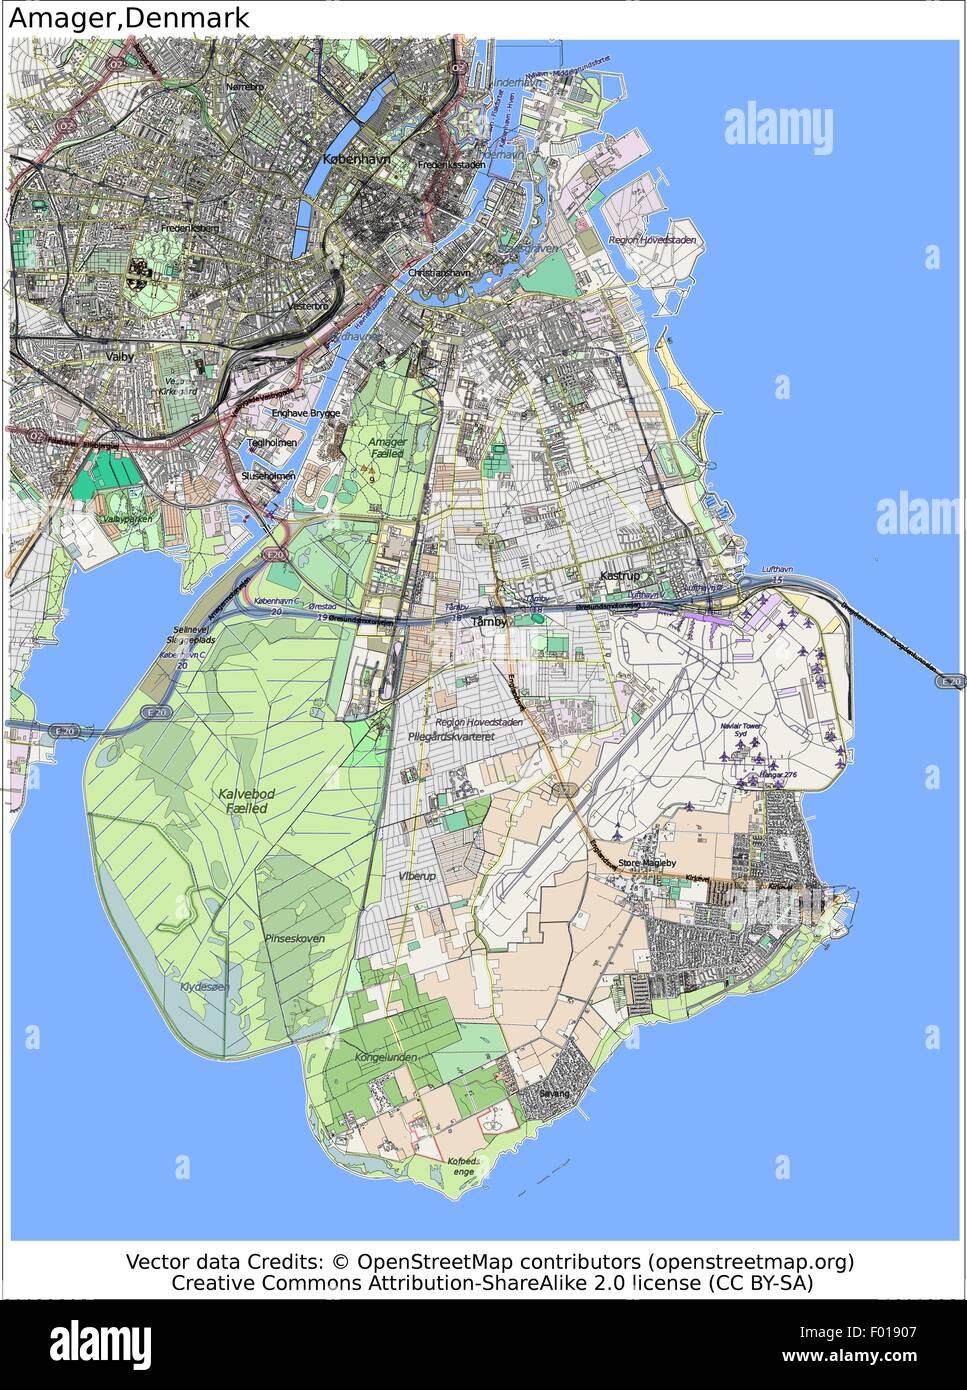 amager copenhagen denmark island city map aerial view stock vector